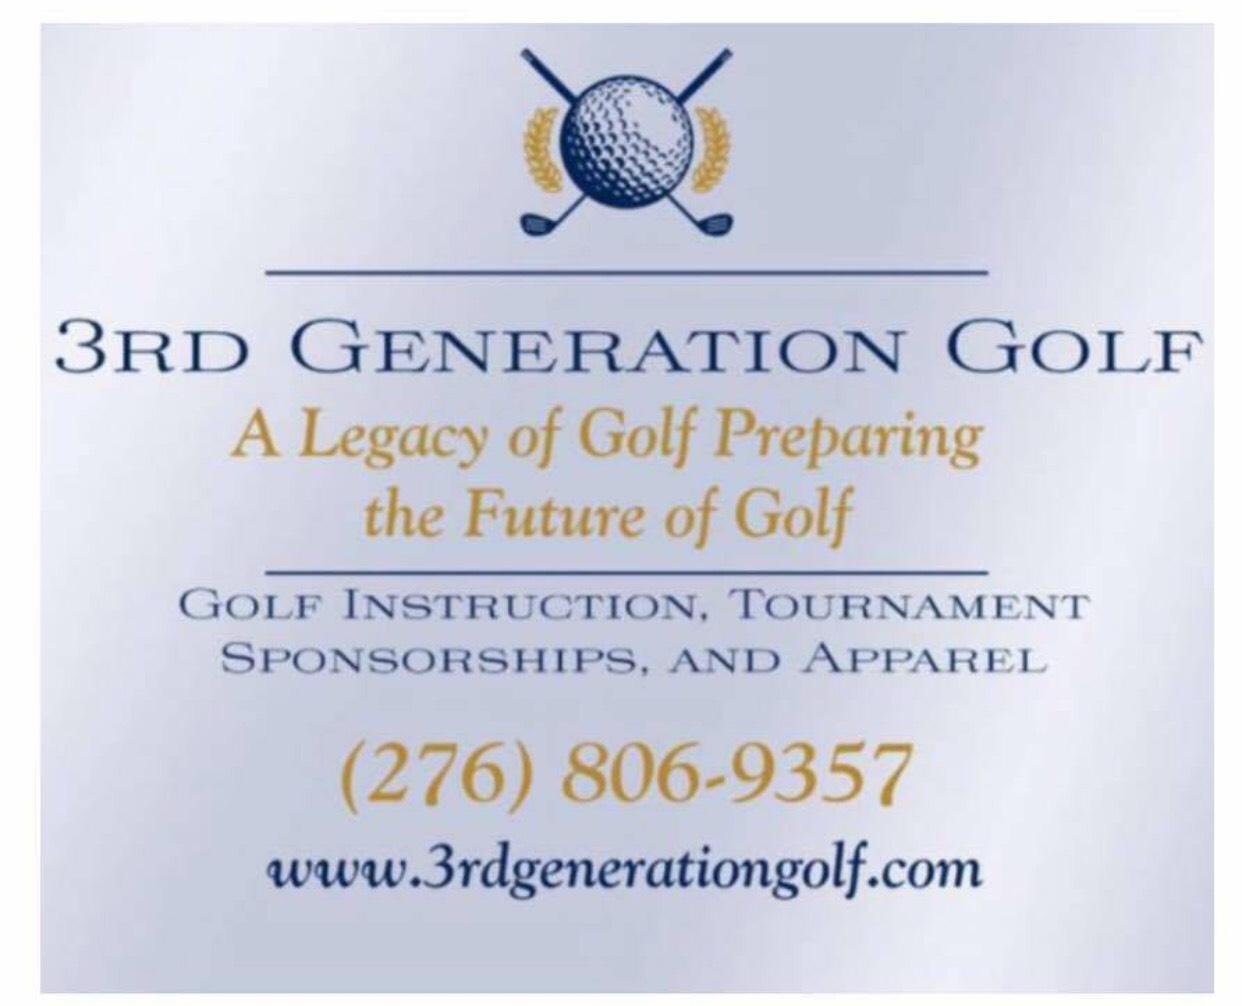 3rd Generation Golf